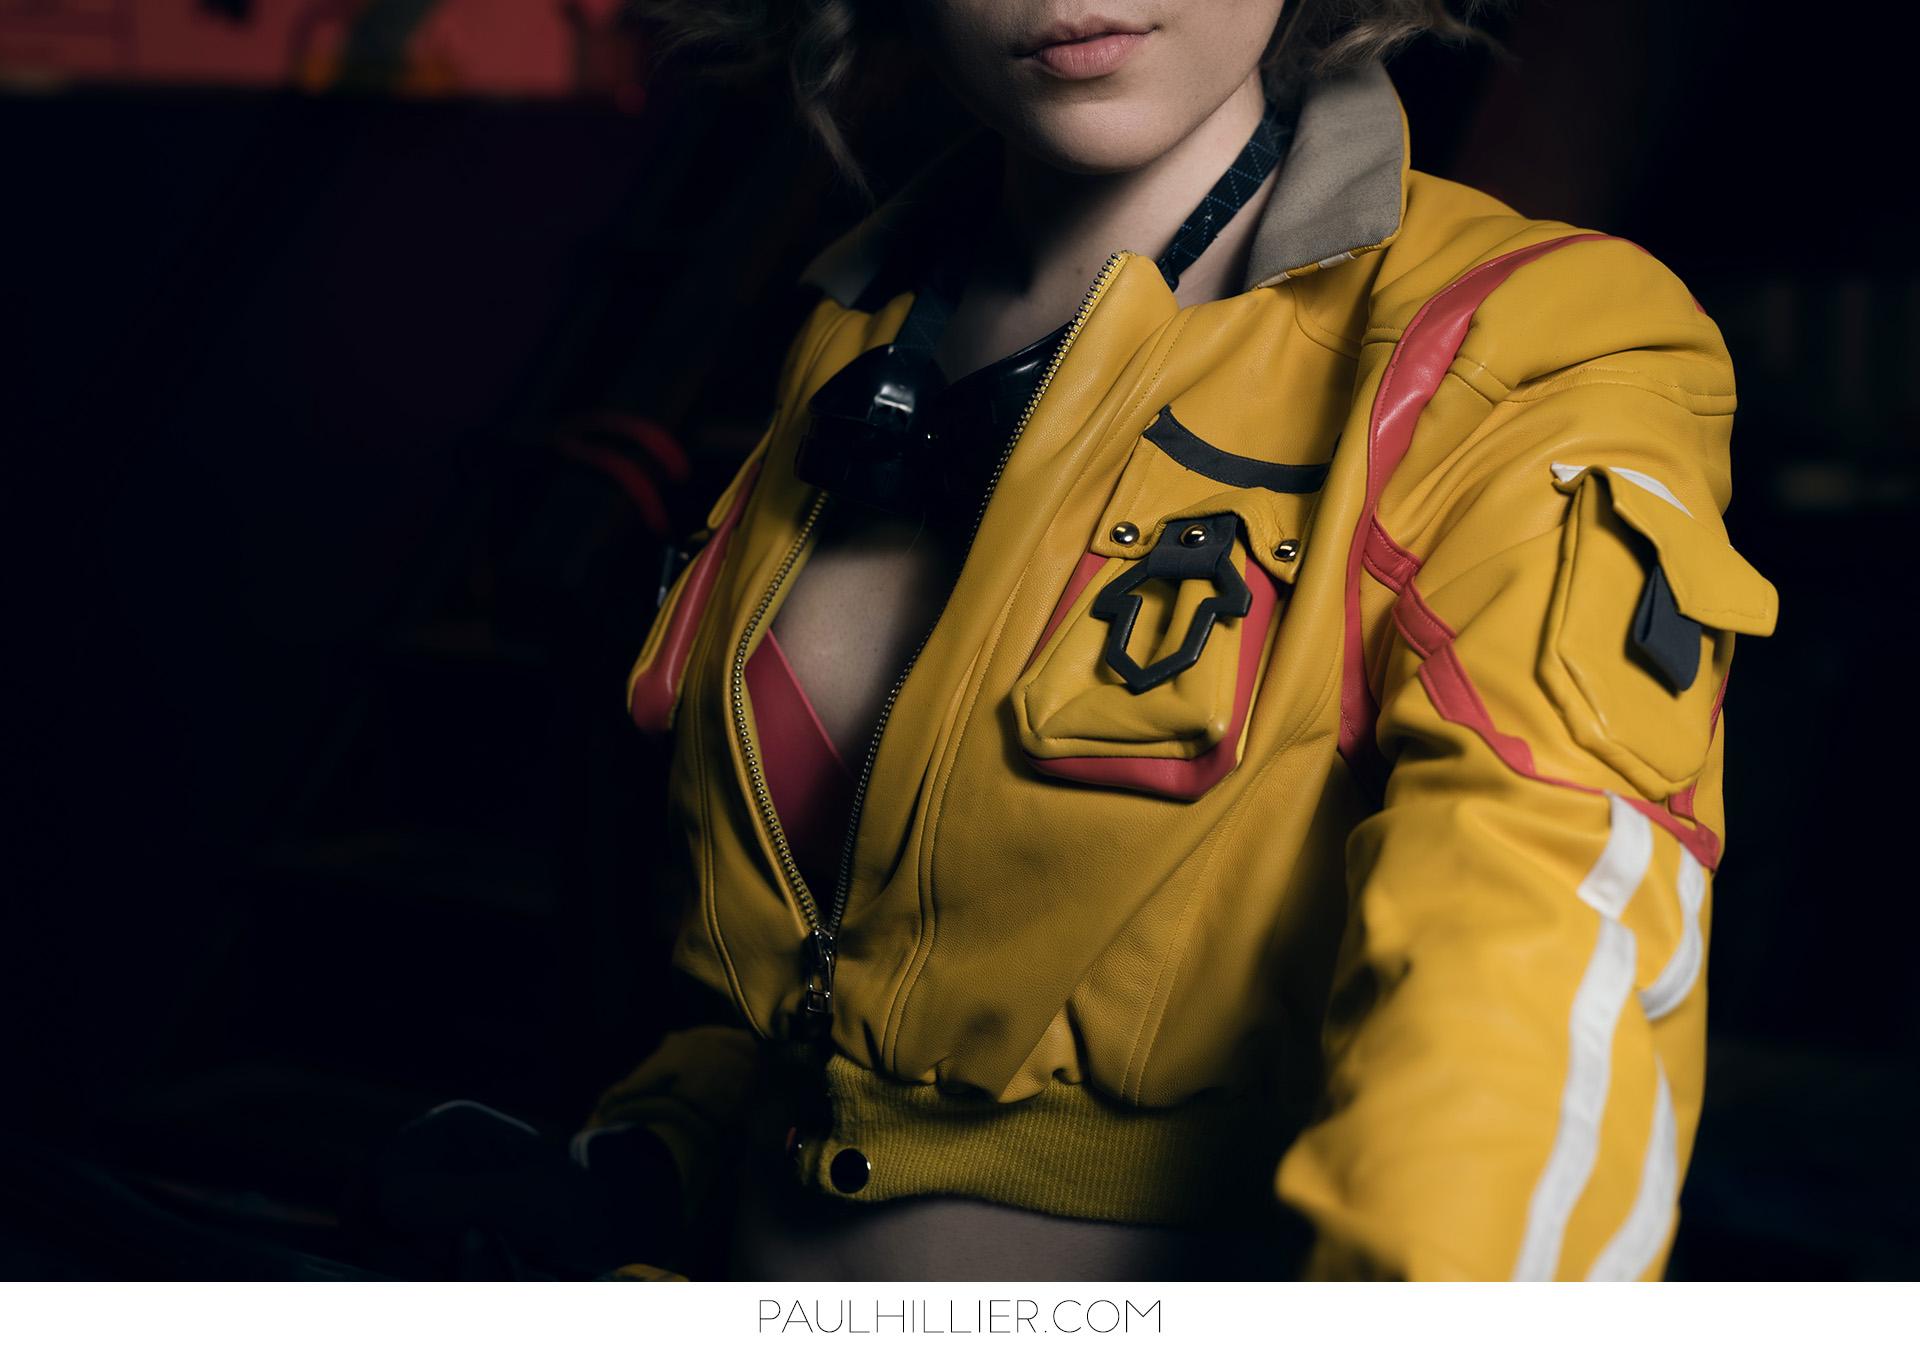 Cindy FFXV Henchmen Props and Sperren Cosplay-1394 sml.jpg